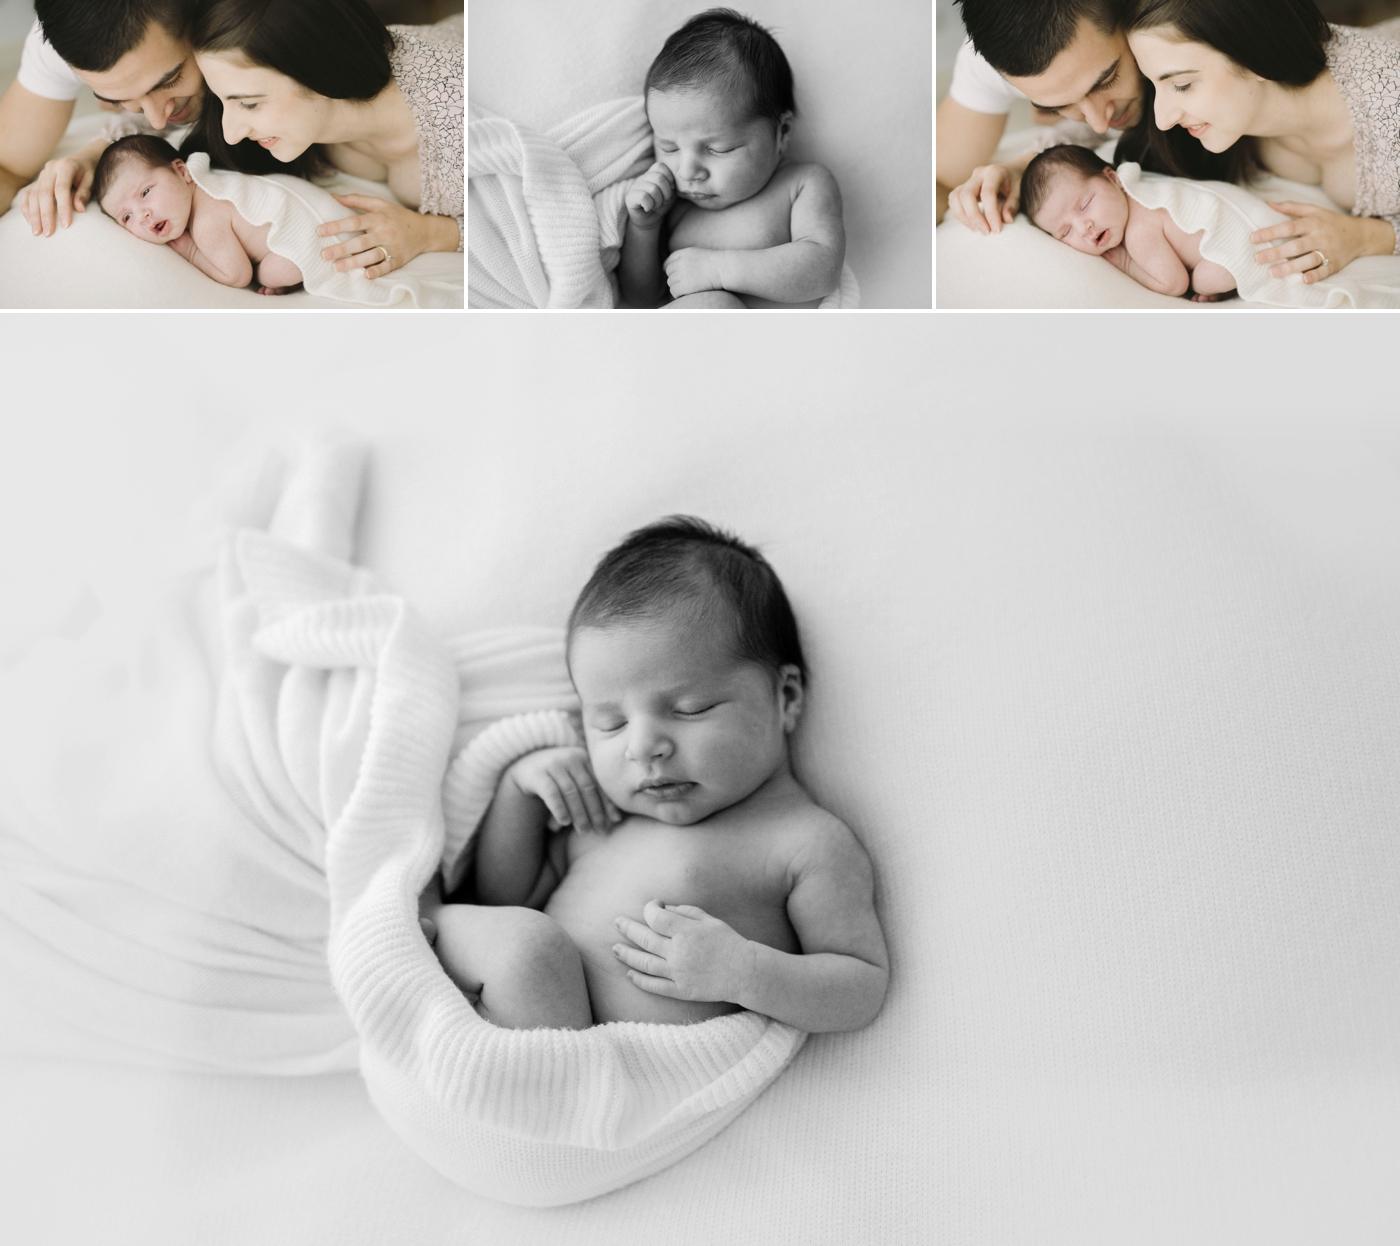 Annabel - Natural Newborn Photographer in Adelaide - Simple and Beautiful Newborn Photography - Katherine Schultz - www.katherineschultzphotography.com_0021.jpg